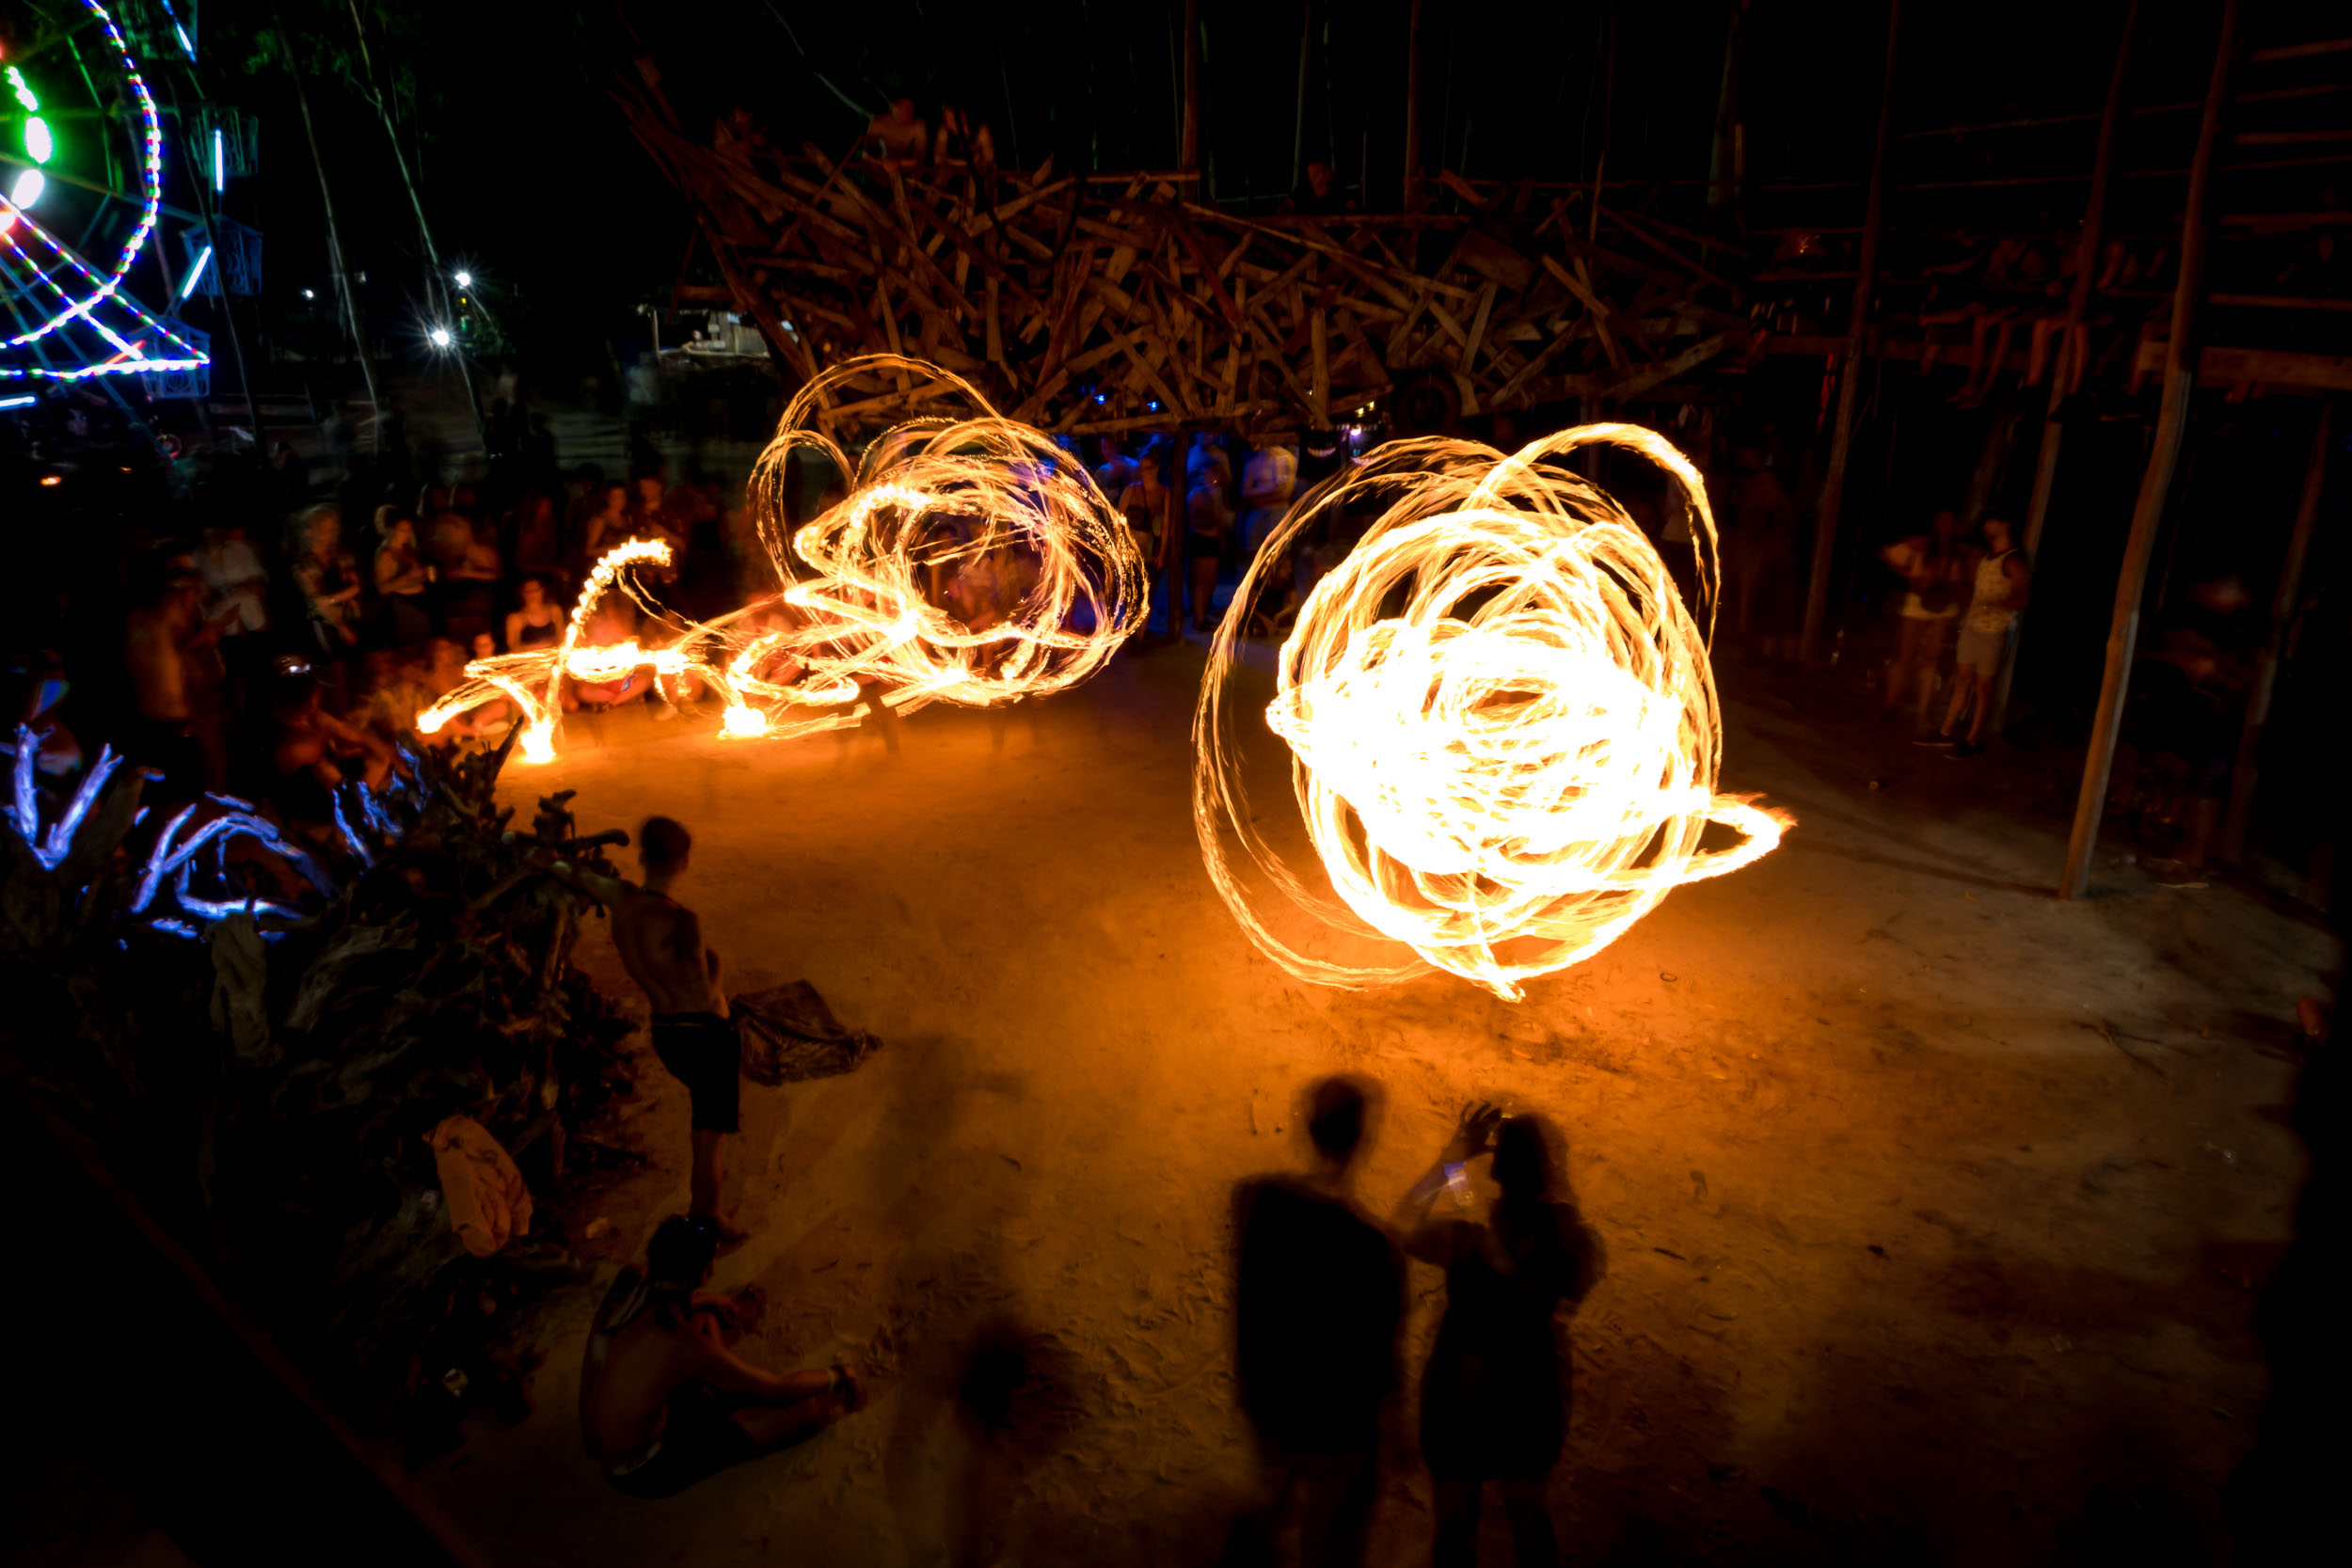 Kerfuffle - Fire Dancer, Otres Village, Sihanoukville, Cambodia.